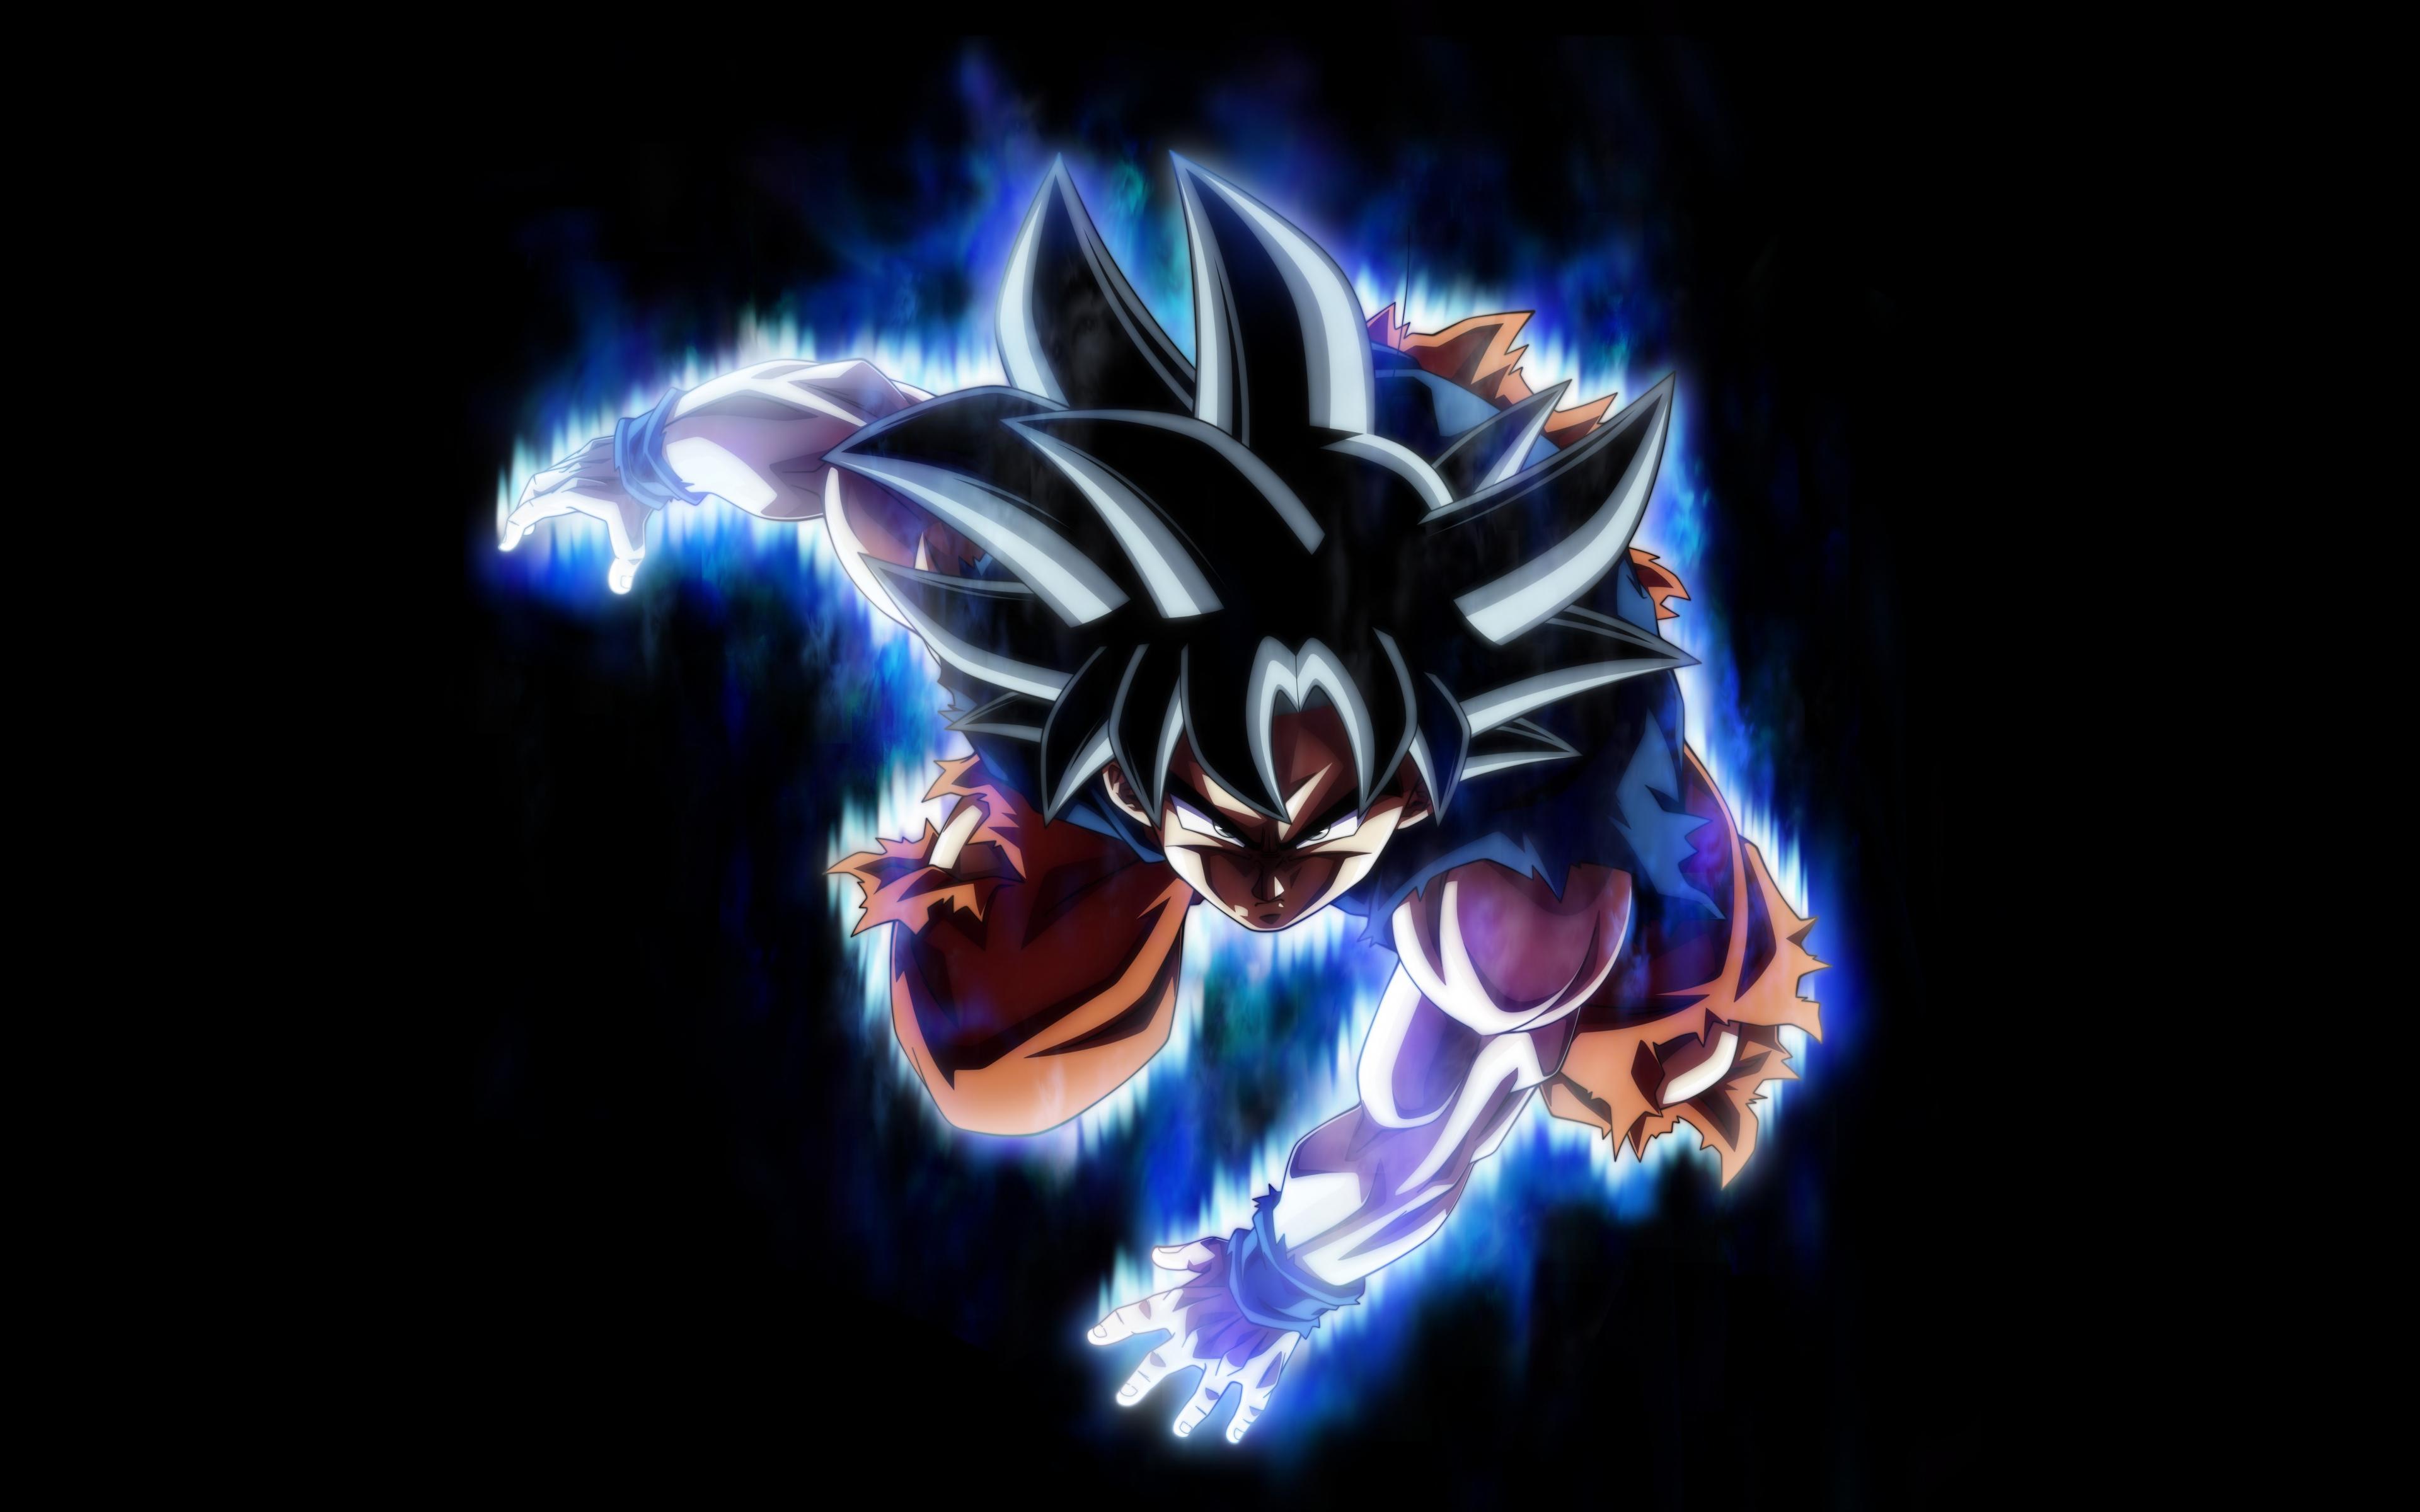 Download 3840x2400 Wallpaper Dragon Ball Super Super Saiyan